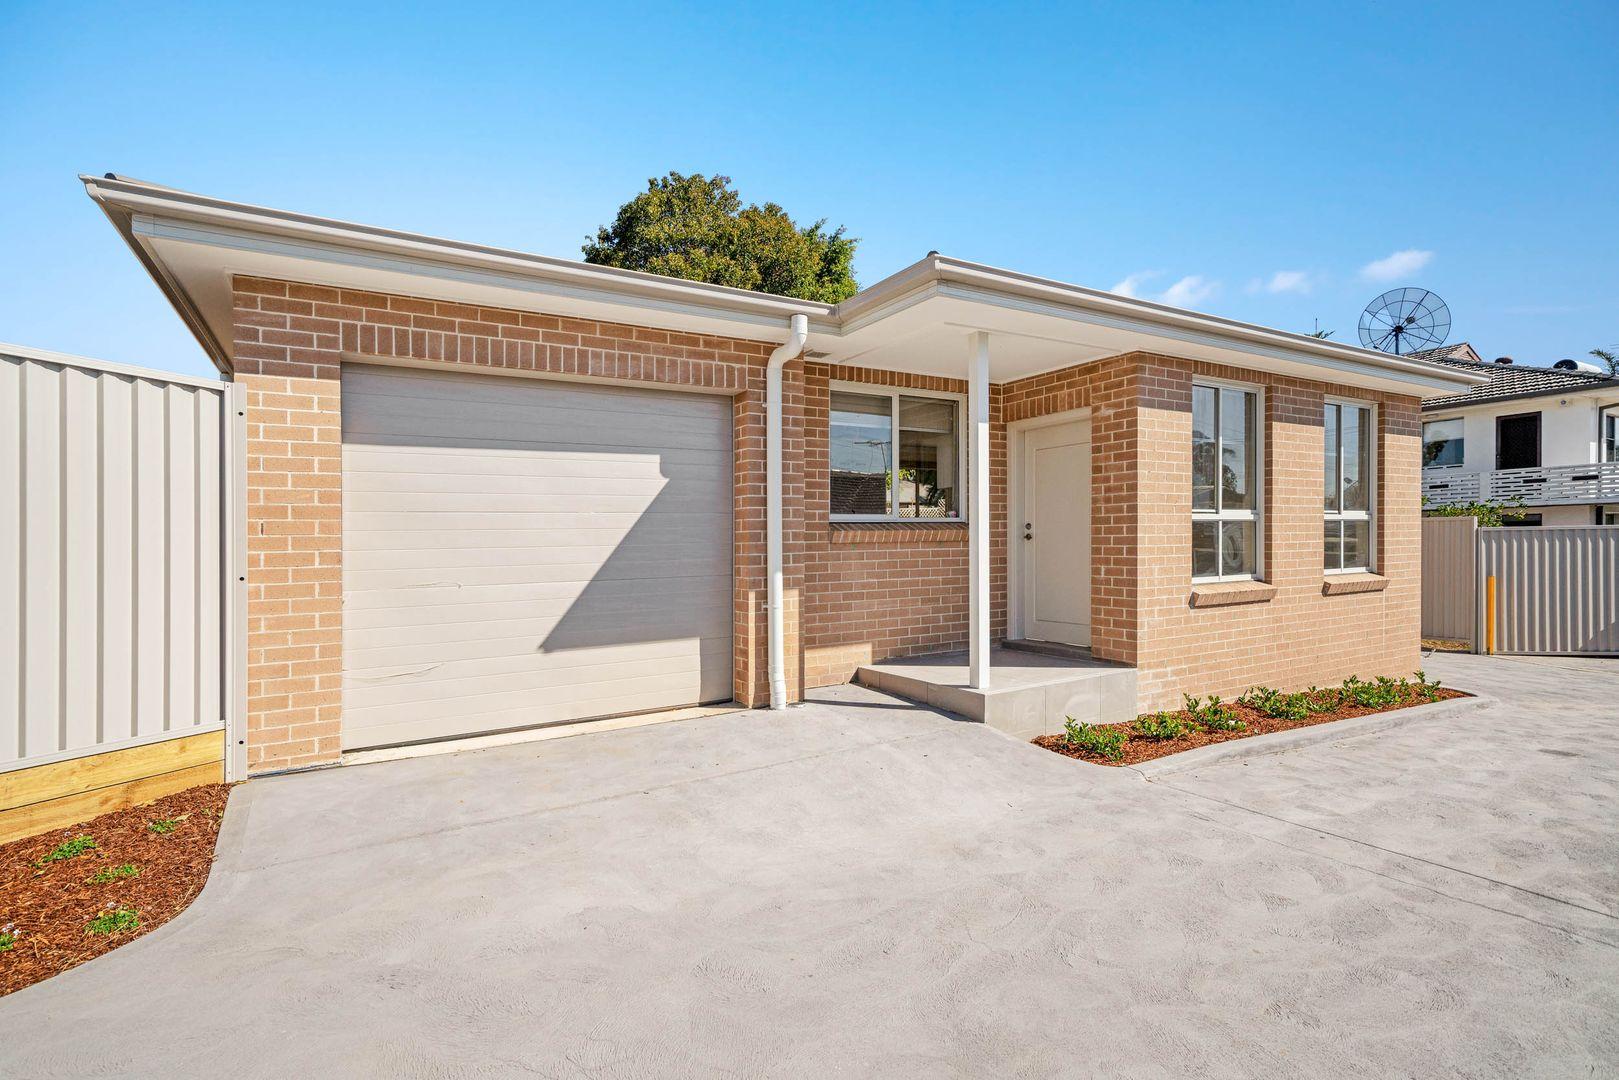 1/155 Girraween Rd, Girraween NSW 2145, Image 1